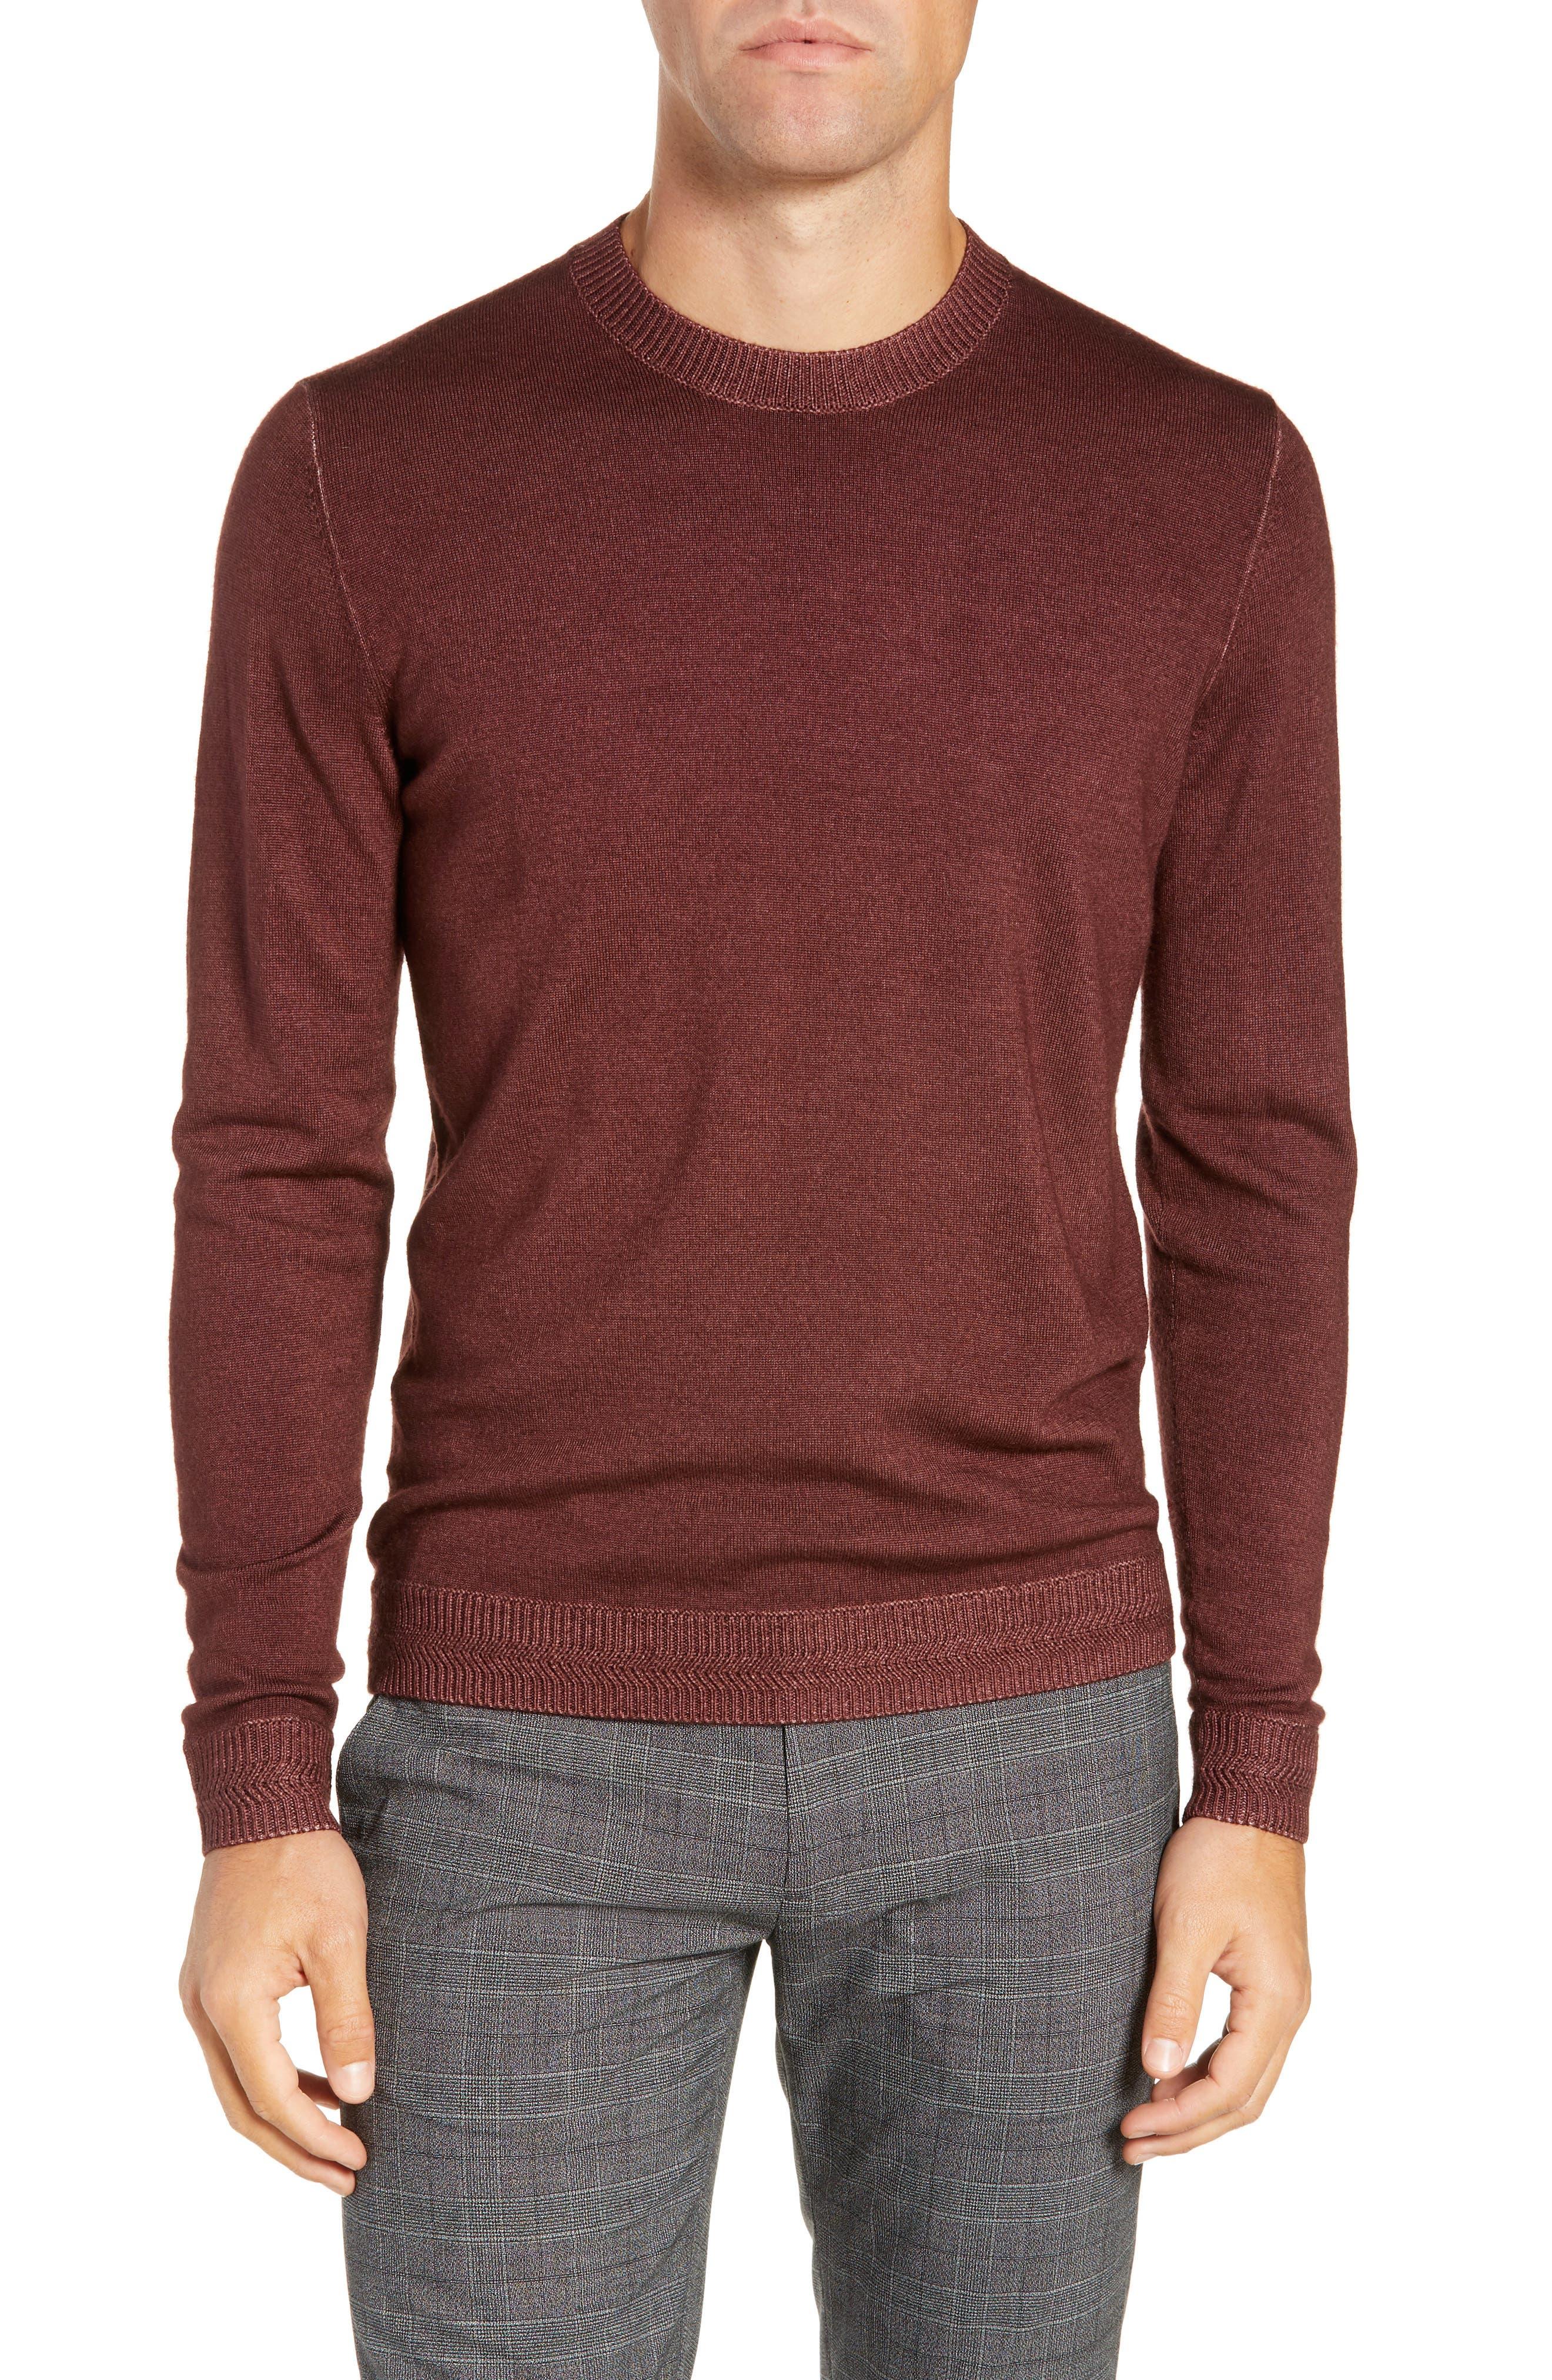 Trim Fit Newab Garment Dyed Wool Sweater,                         Main,                         color, MAROON